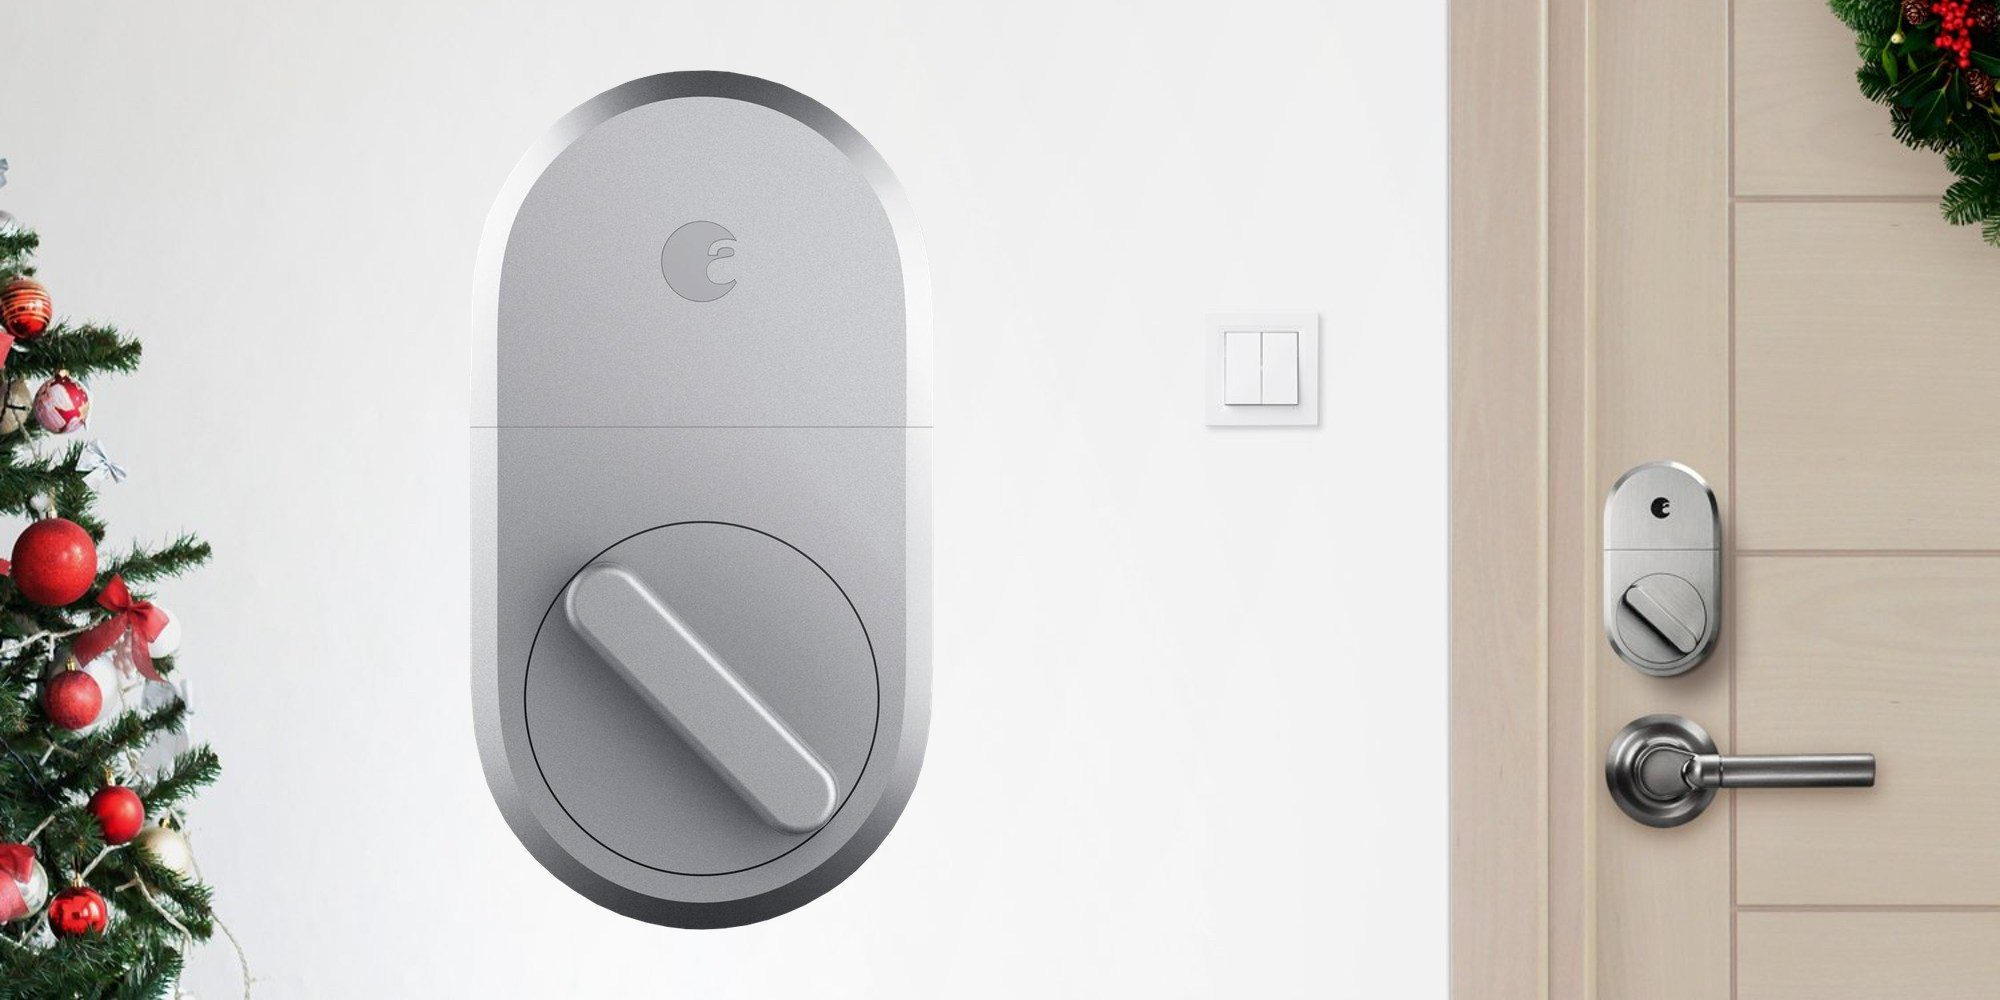 9to5Toys Mittagspause: Moto X4 Smartphone $ 165, August Smart Lock $ 100, Bose SoundSport-Kopfhörer $ 50, mehr